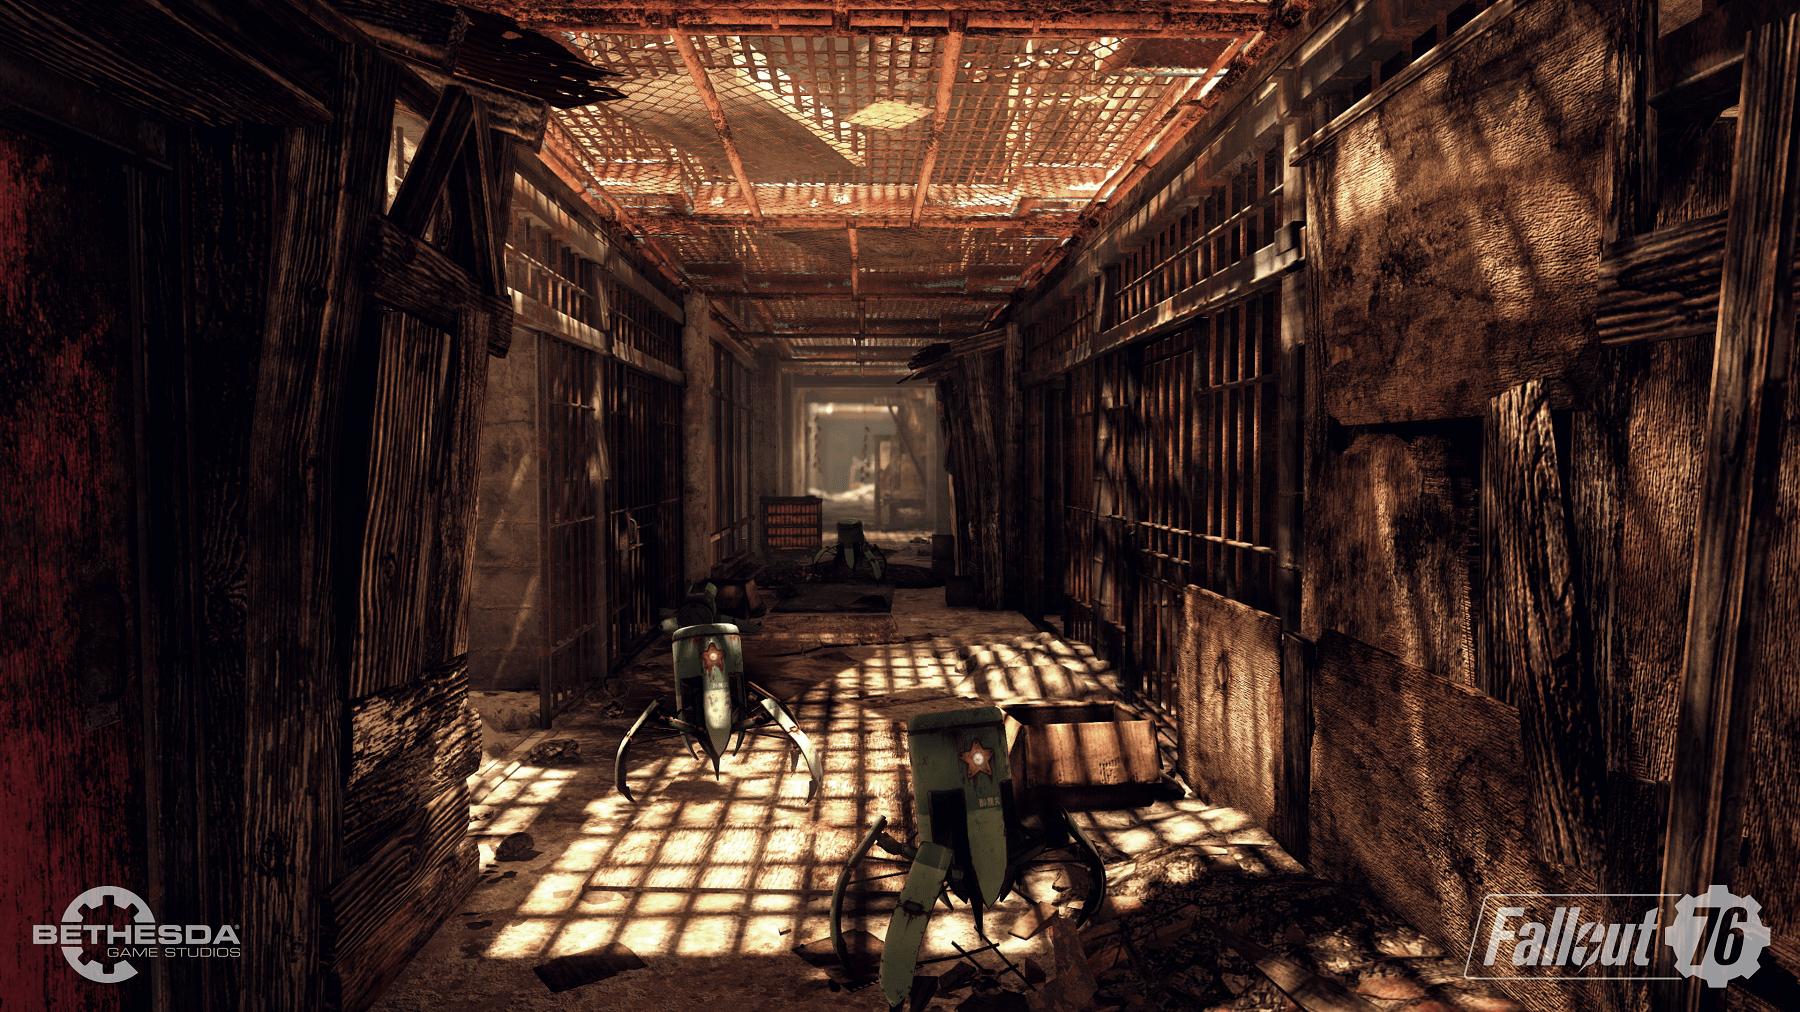 Fallout76 4